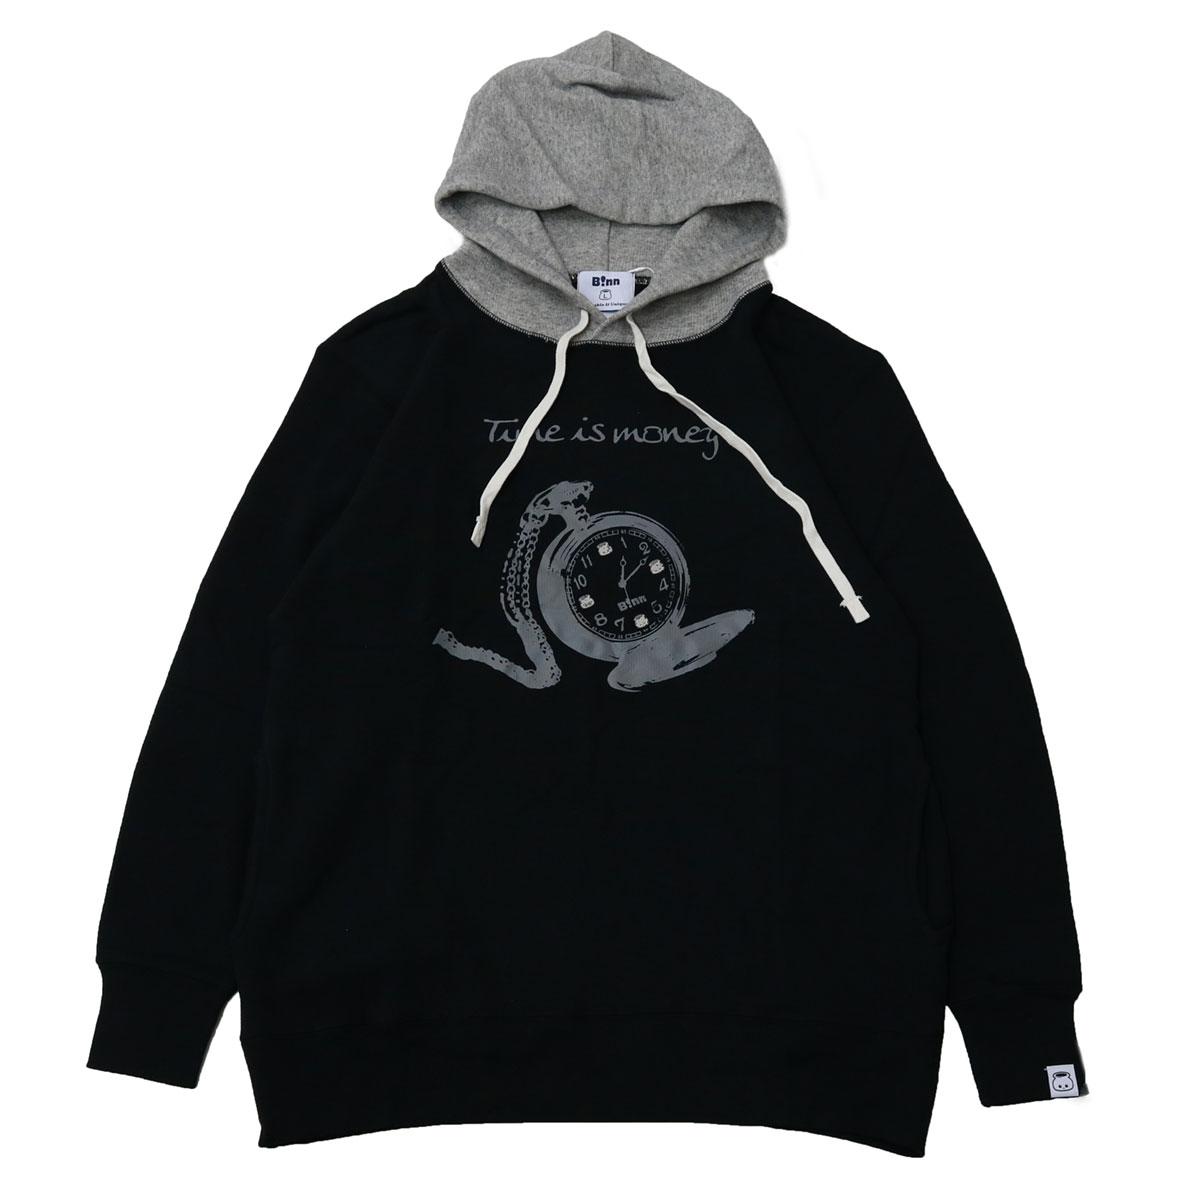 TIME IS MONEY Hoodie (Black x Gray)